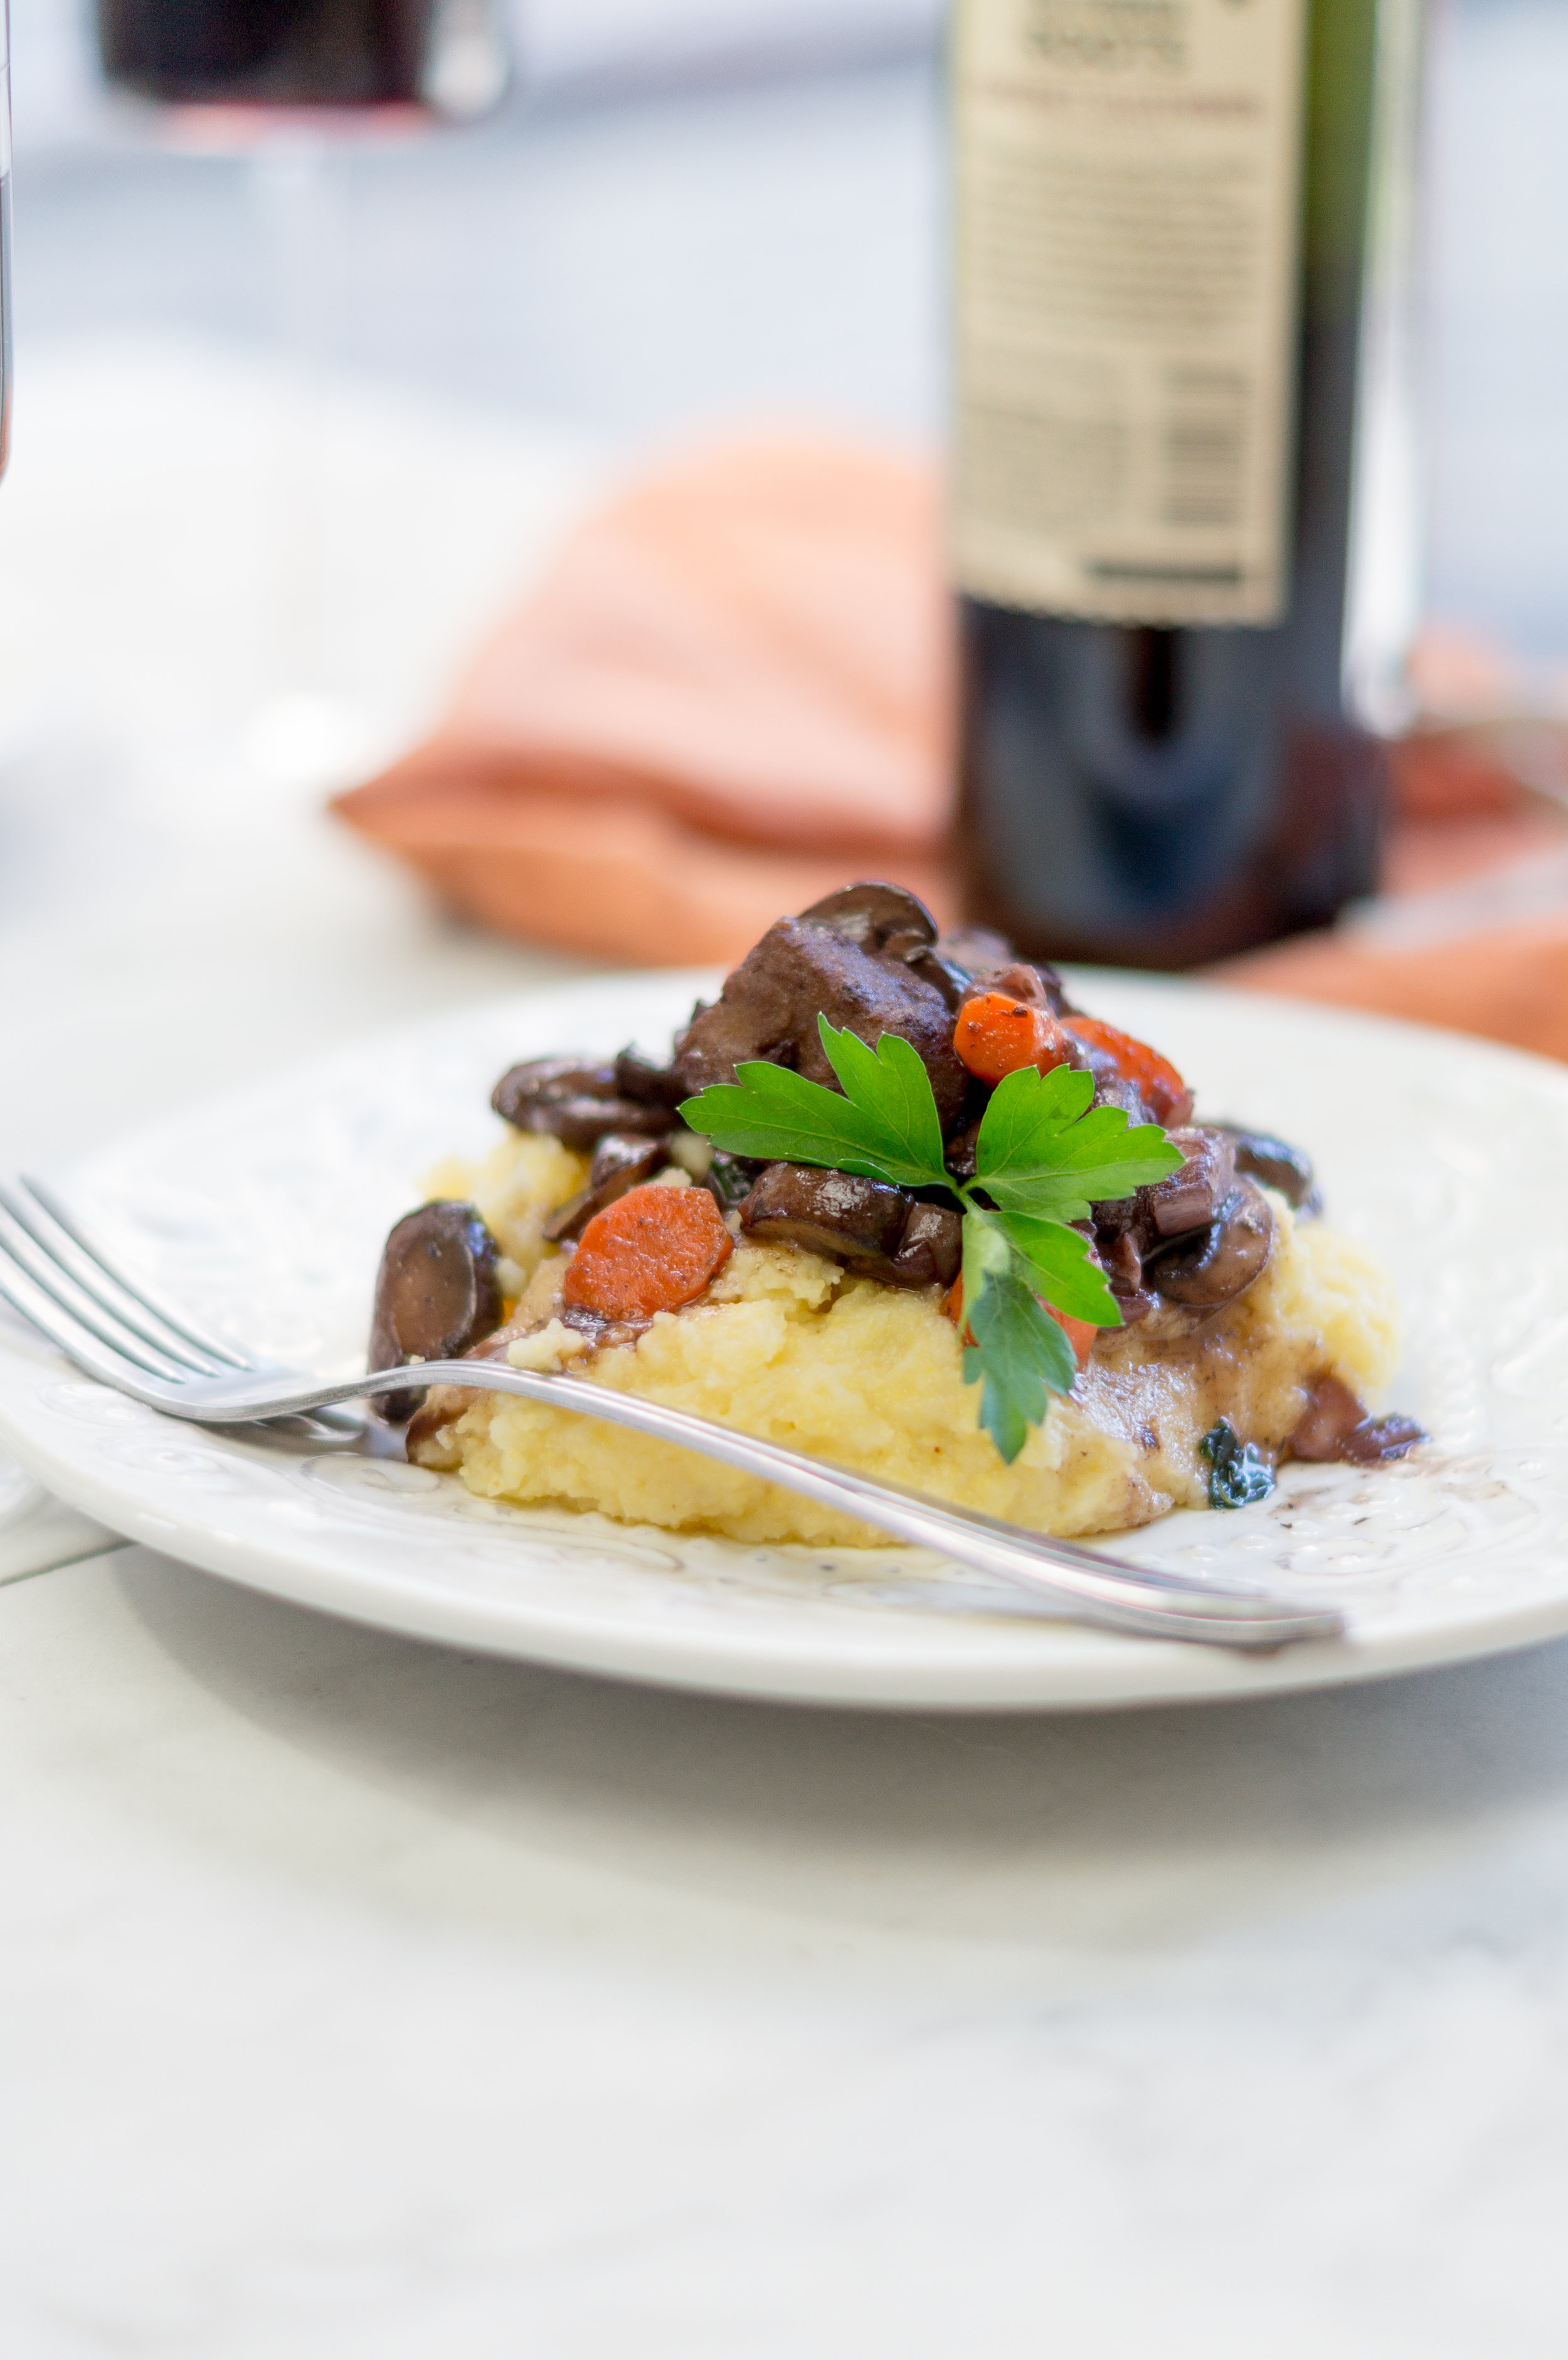 i am rorie, i am rorie recipes, whole foods, vegan food, vegan dinner, vegan stew, carrots, parsley, fresh parsley, salt, pink himalayan salt, garlic, polenta, vegan parmesan, vegan butter, parmesan, butter, vegan beef, beef tips, vegan beef tips, gardein beefless tips,shallot, cremini mushrooms, mushrooms, slurry, arrowroot flour, water, milk, almond milk, plant-based milk,wine, red wine, cooking with wine, wine in recipes, recipe using wine, hearty vegan recipe, vegan meal prep, winter meal prep, vegan winter meal prep, new year diet meal prep,chicago vegan blog, vegan blogger, vegan recipes, chicago blogger, food blogger, vegan food blogger, delicious vegan food, vegan health, vegan lifestyle